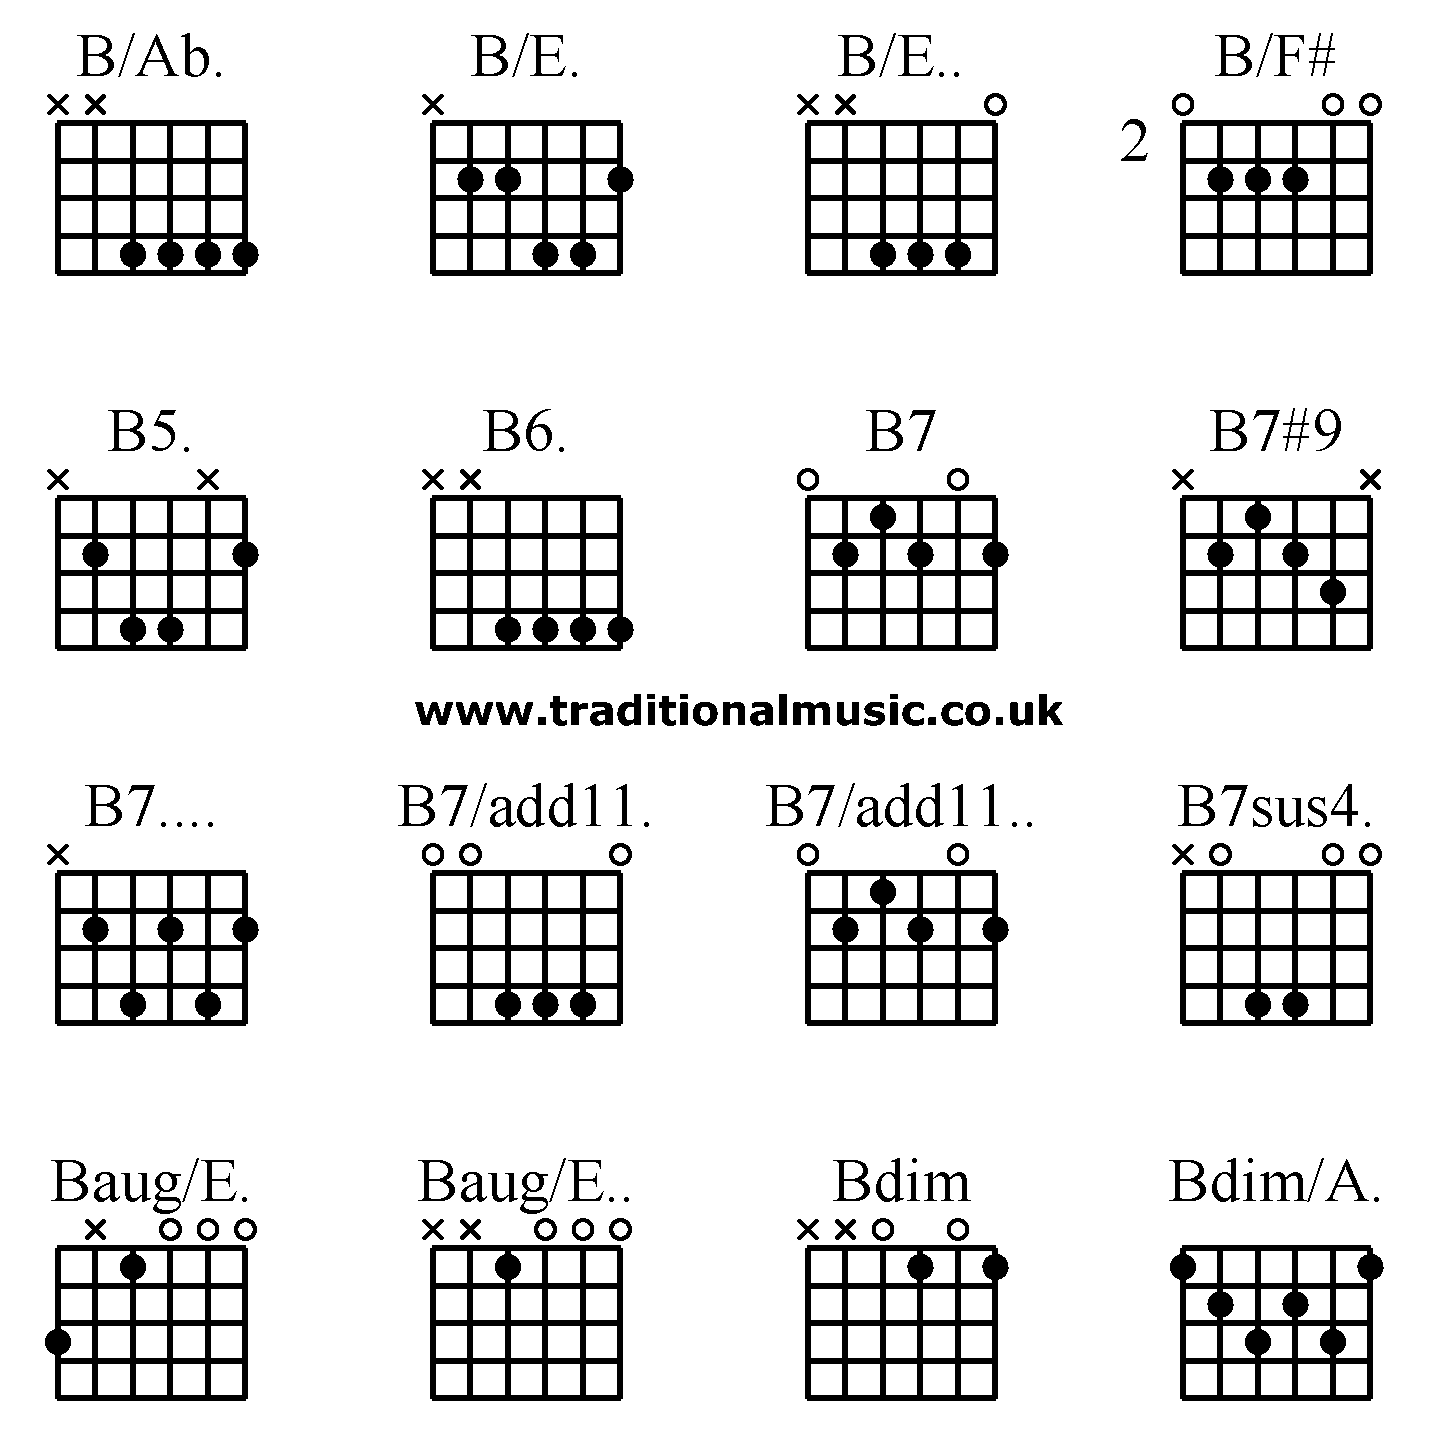 Guitat Chords: Advanced Guitar Chords:B/Ab. B/E. B/E.. B/F#, B5. B6. B7